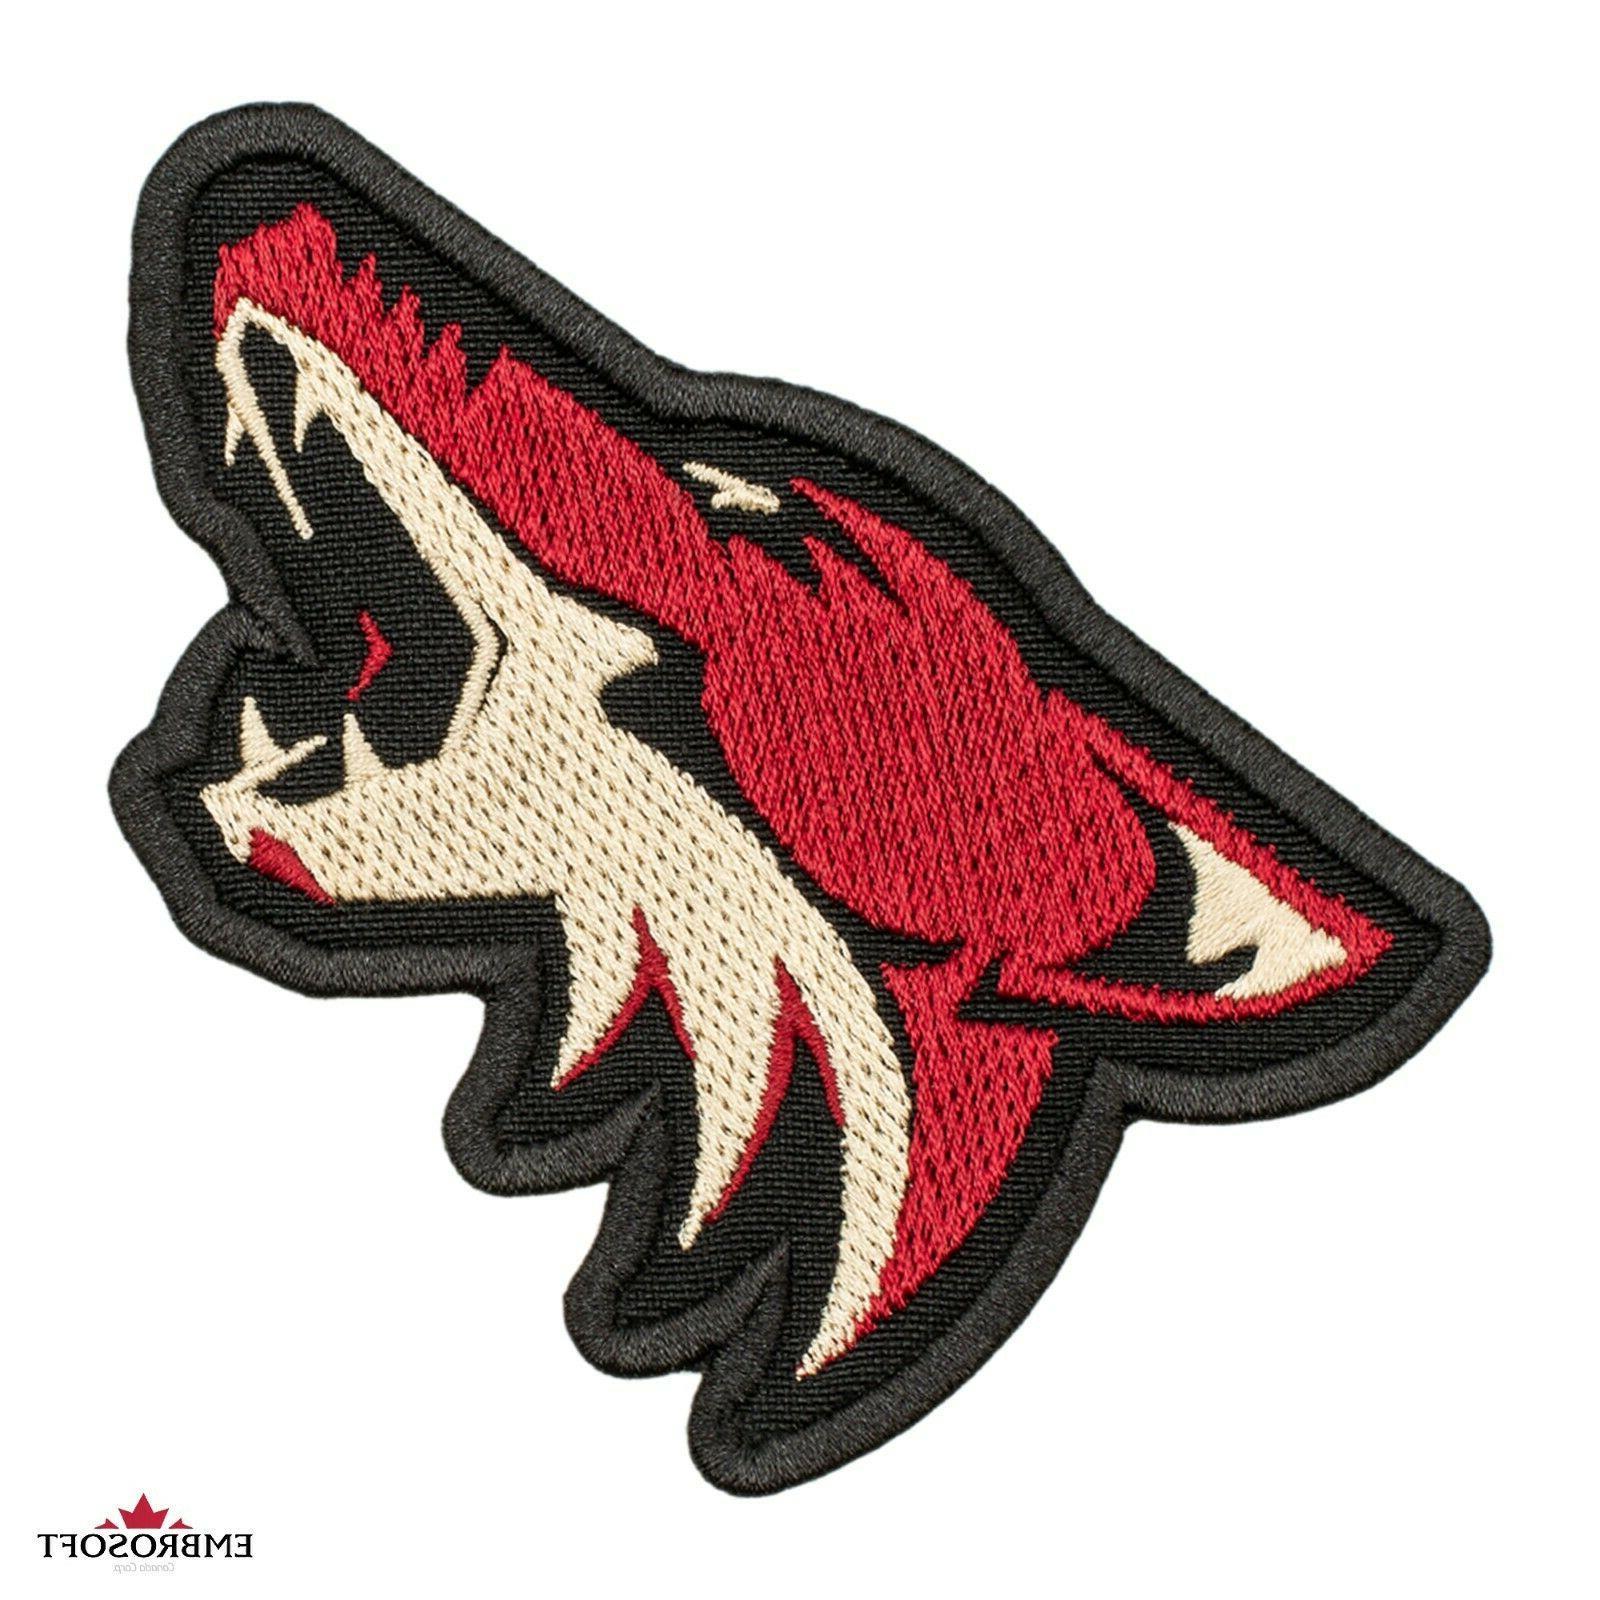 arizona coyotes patch nhl sports team emblem